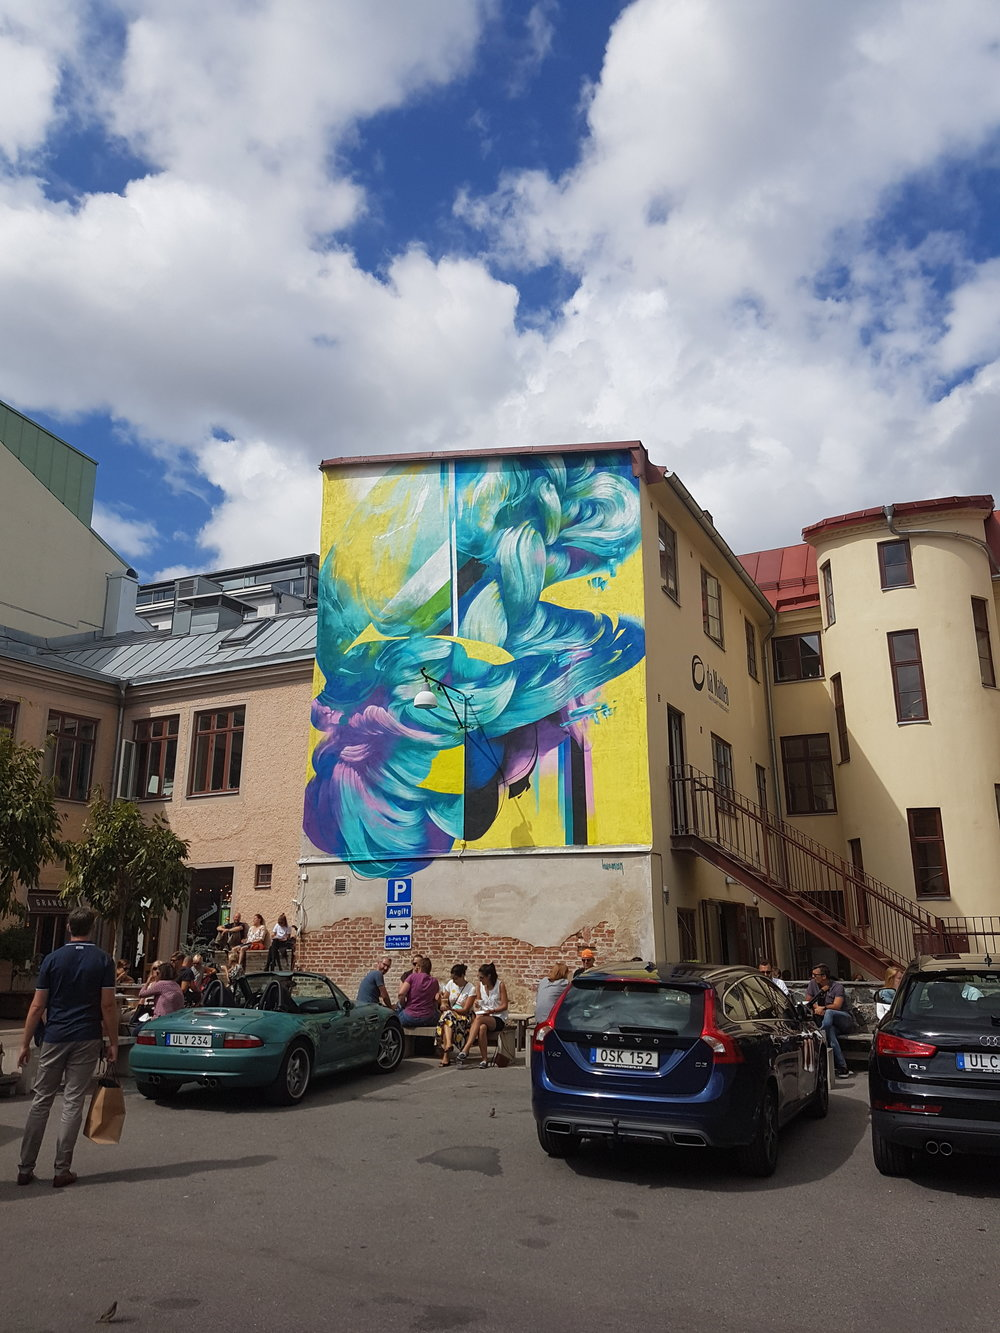 HUEMAN_Artscape_2016-07-31_TorHedendahl_4032x3024_29.jpg